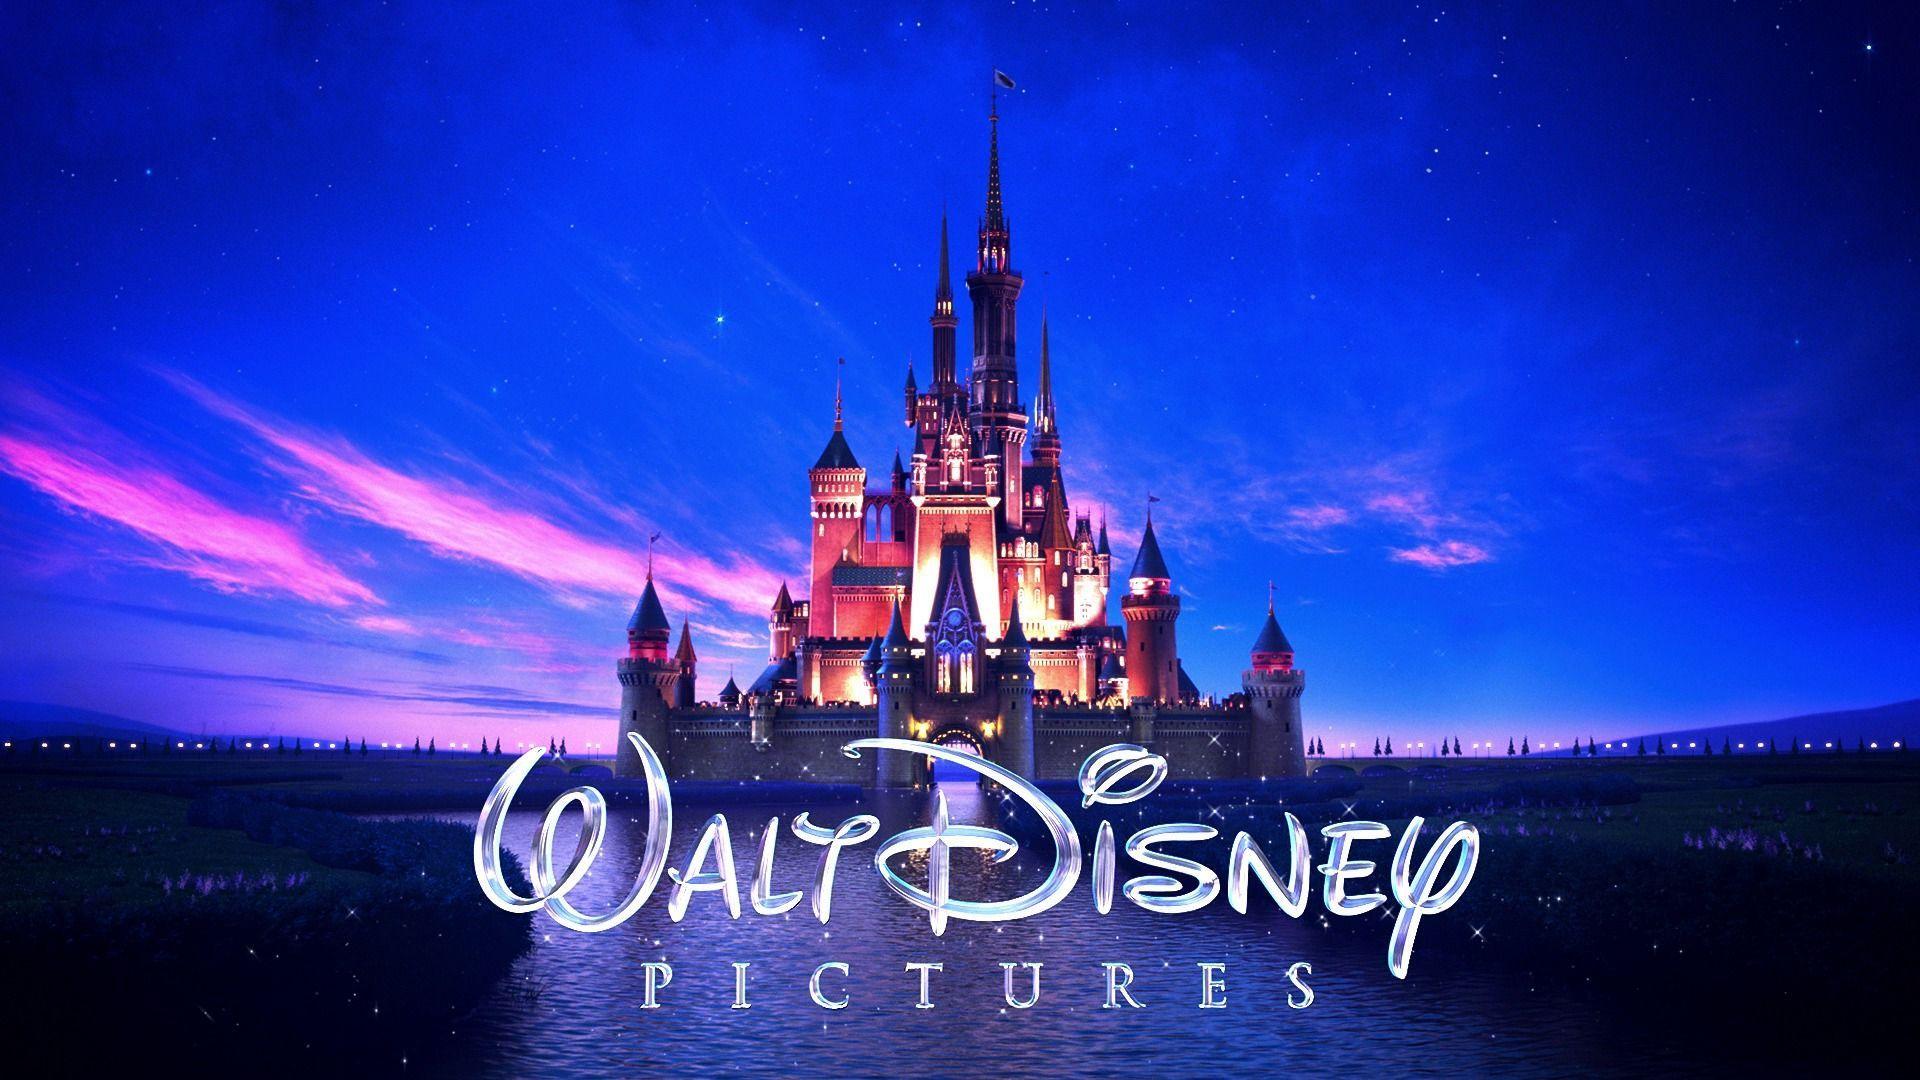 Disney Princess Aqua Hd Wallpaper further Pamuk Prenses Ve Yedi Cuceler together with 25 Days Disney Christmas Movies likewise Motivation Wallpapers further 21fondos De Pantalla. on walt disney world desktop themes